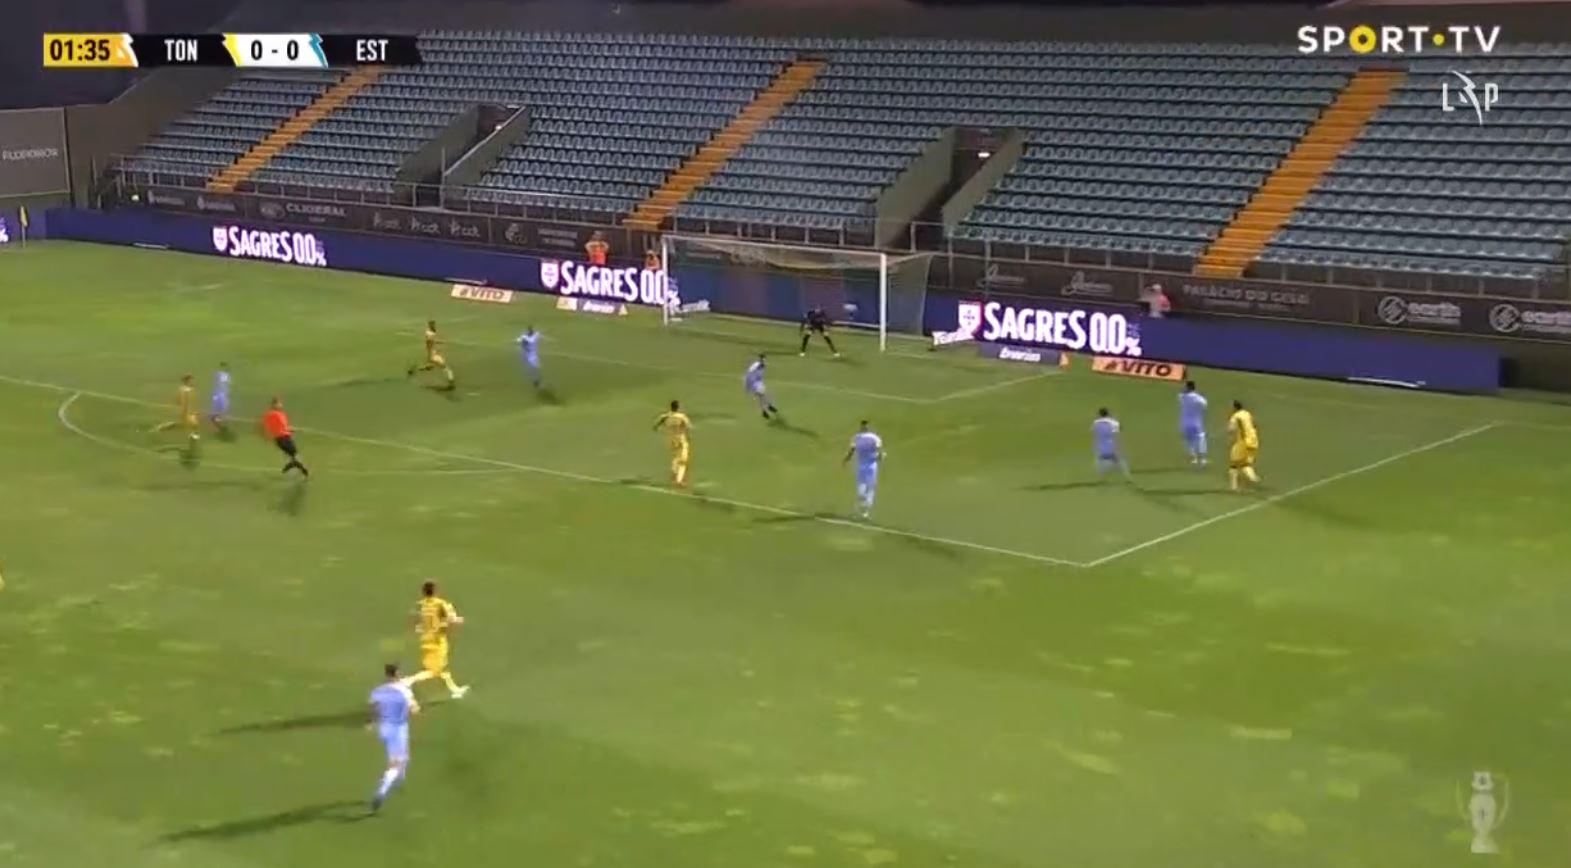 Tondela 1-2 Estoril 2021.09.13 (21h15)  Full Goals Highlight